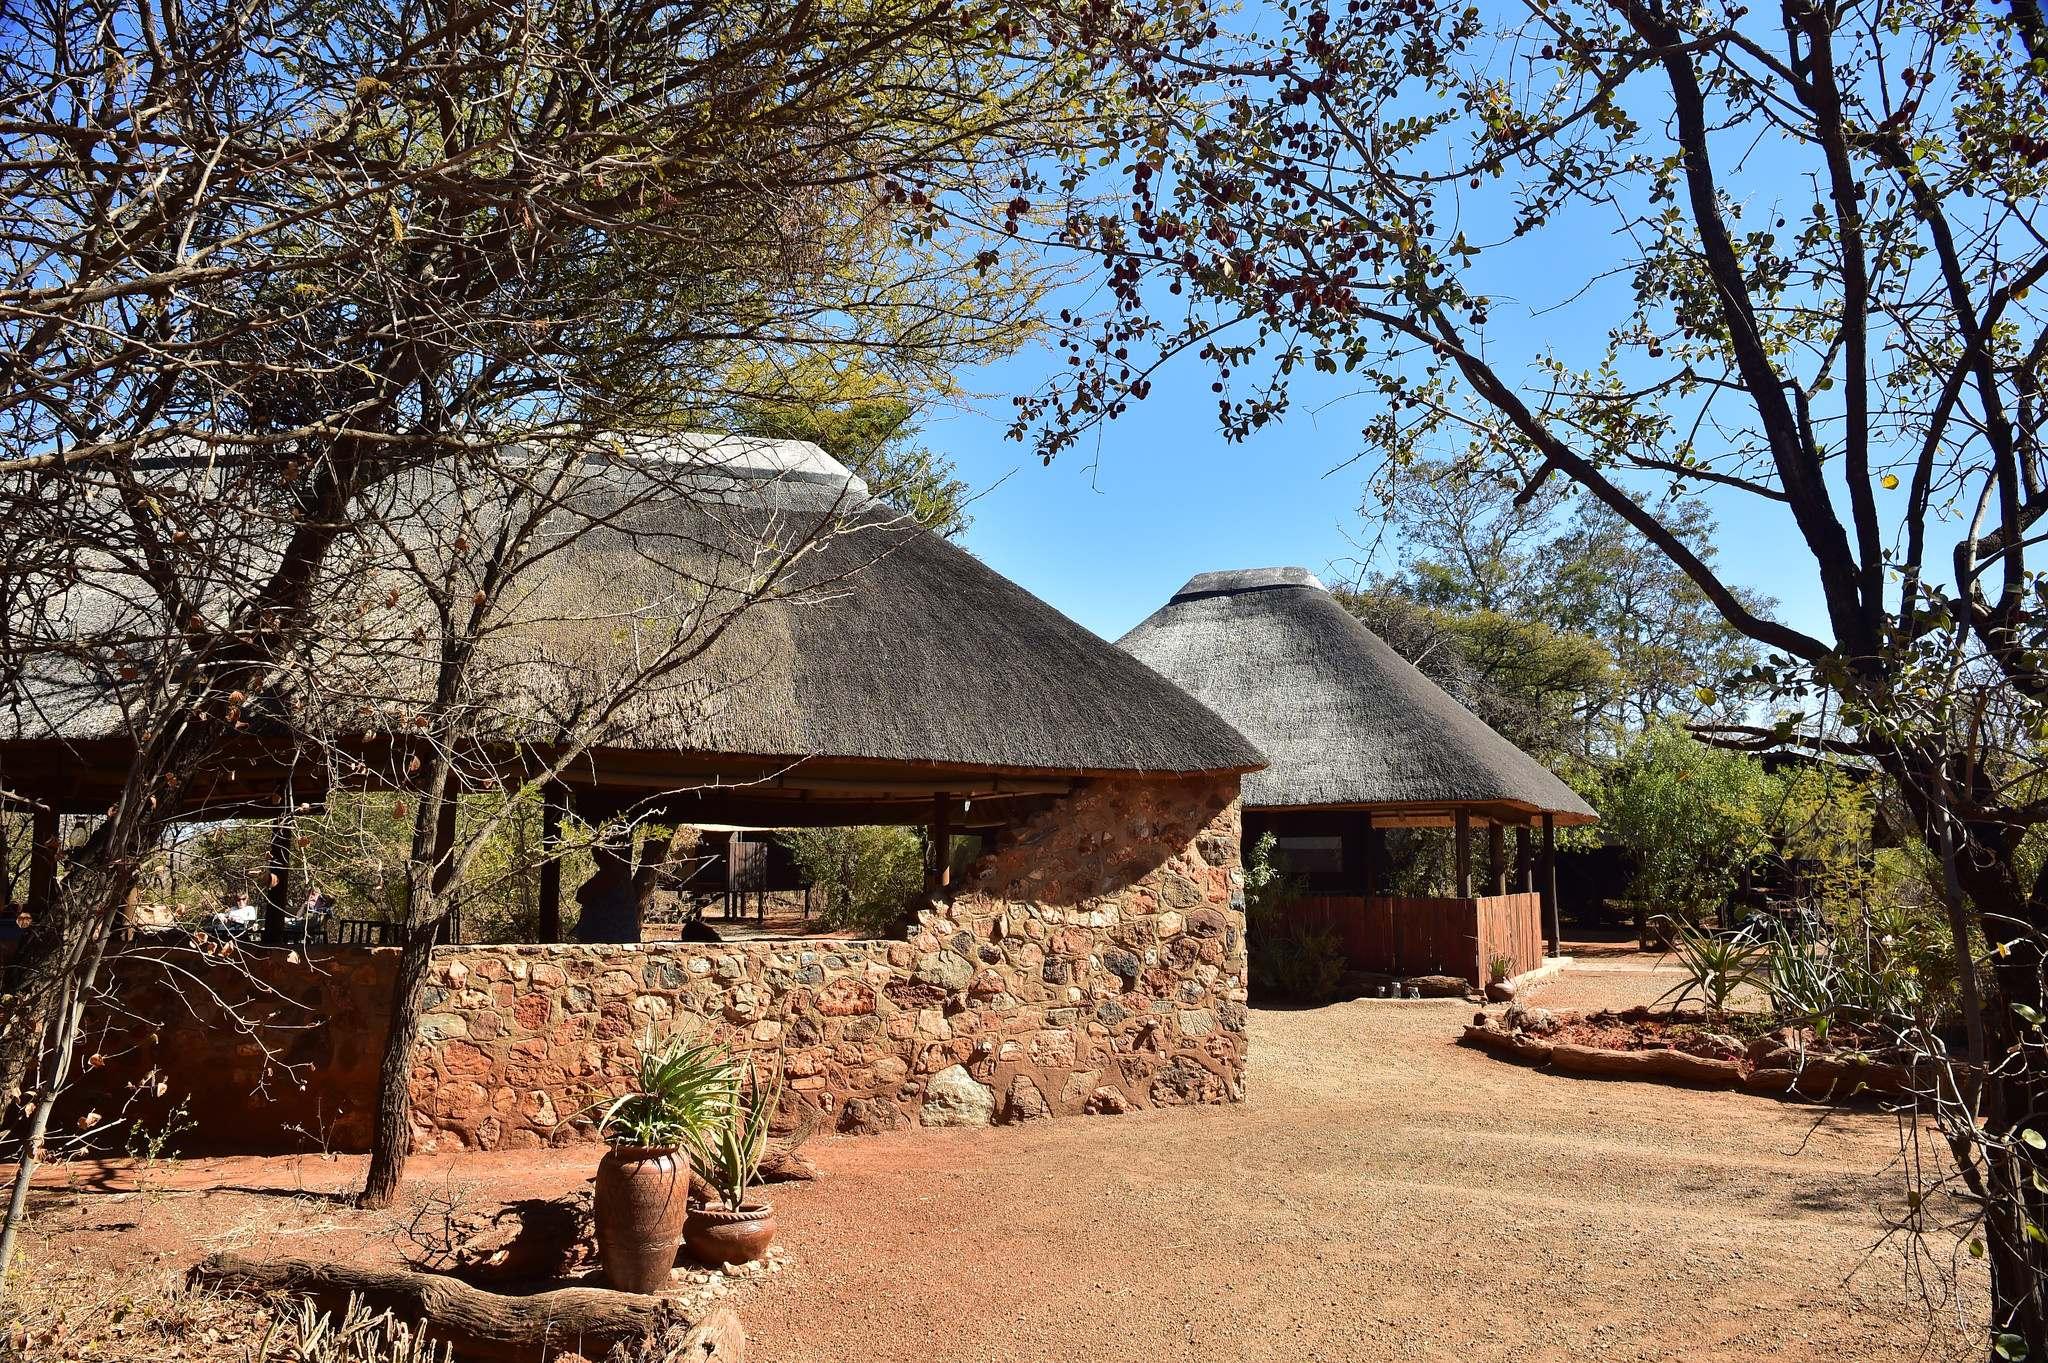 mosetlha bush camp6 Mosetlha Bush Camp at Madikwe Game Reserve